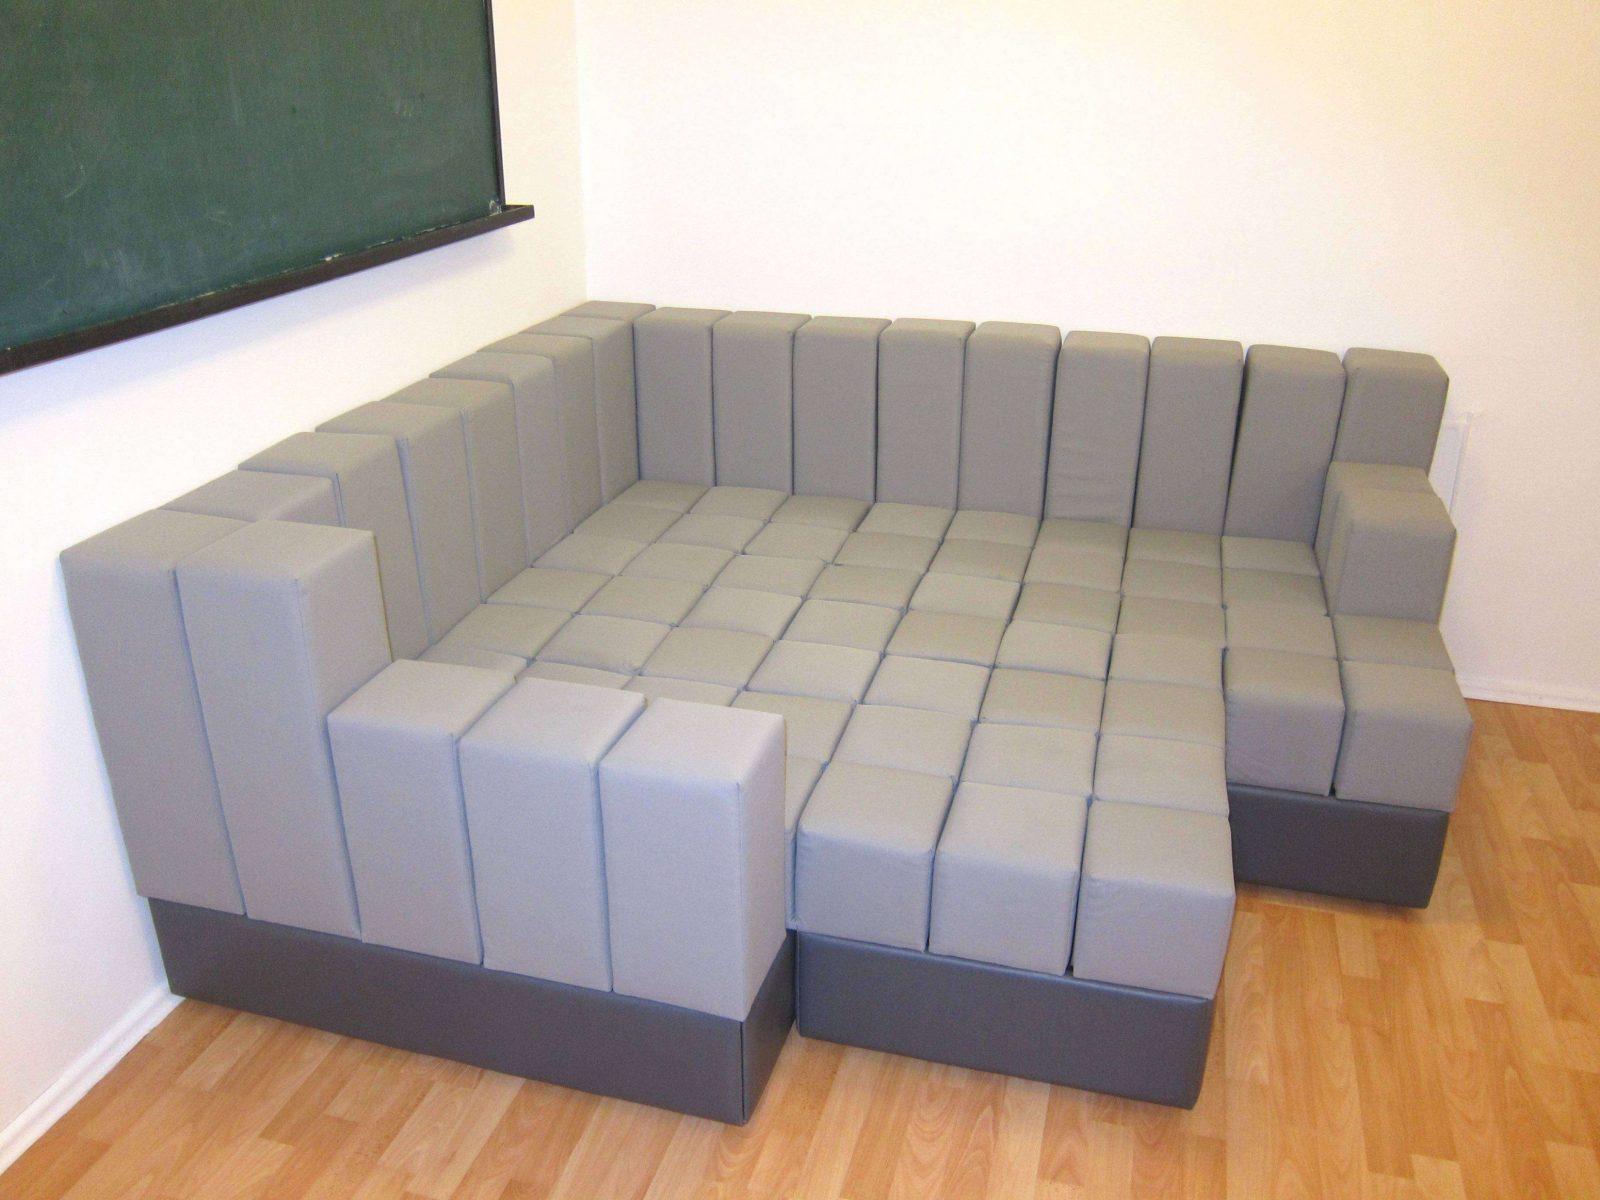 Lounge Sofa Selber Bauen Lounge Sessel Selber Bauen Balkon Sofa von Lounge Sofa Selber Bauen Bild